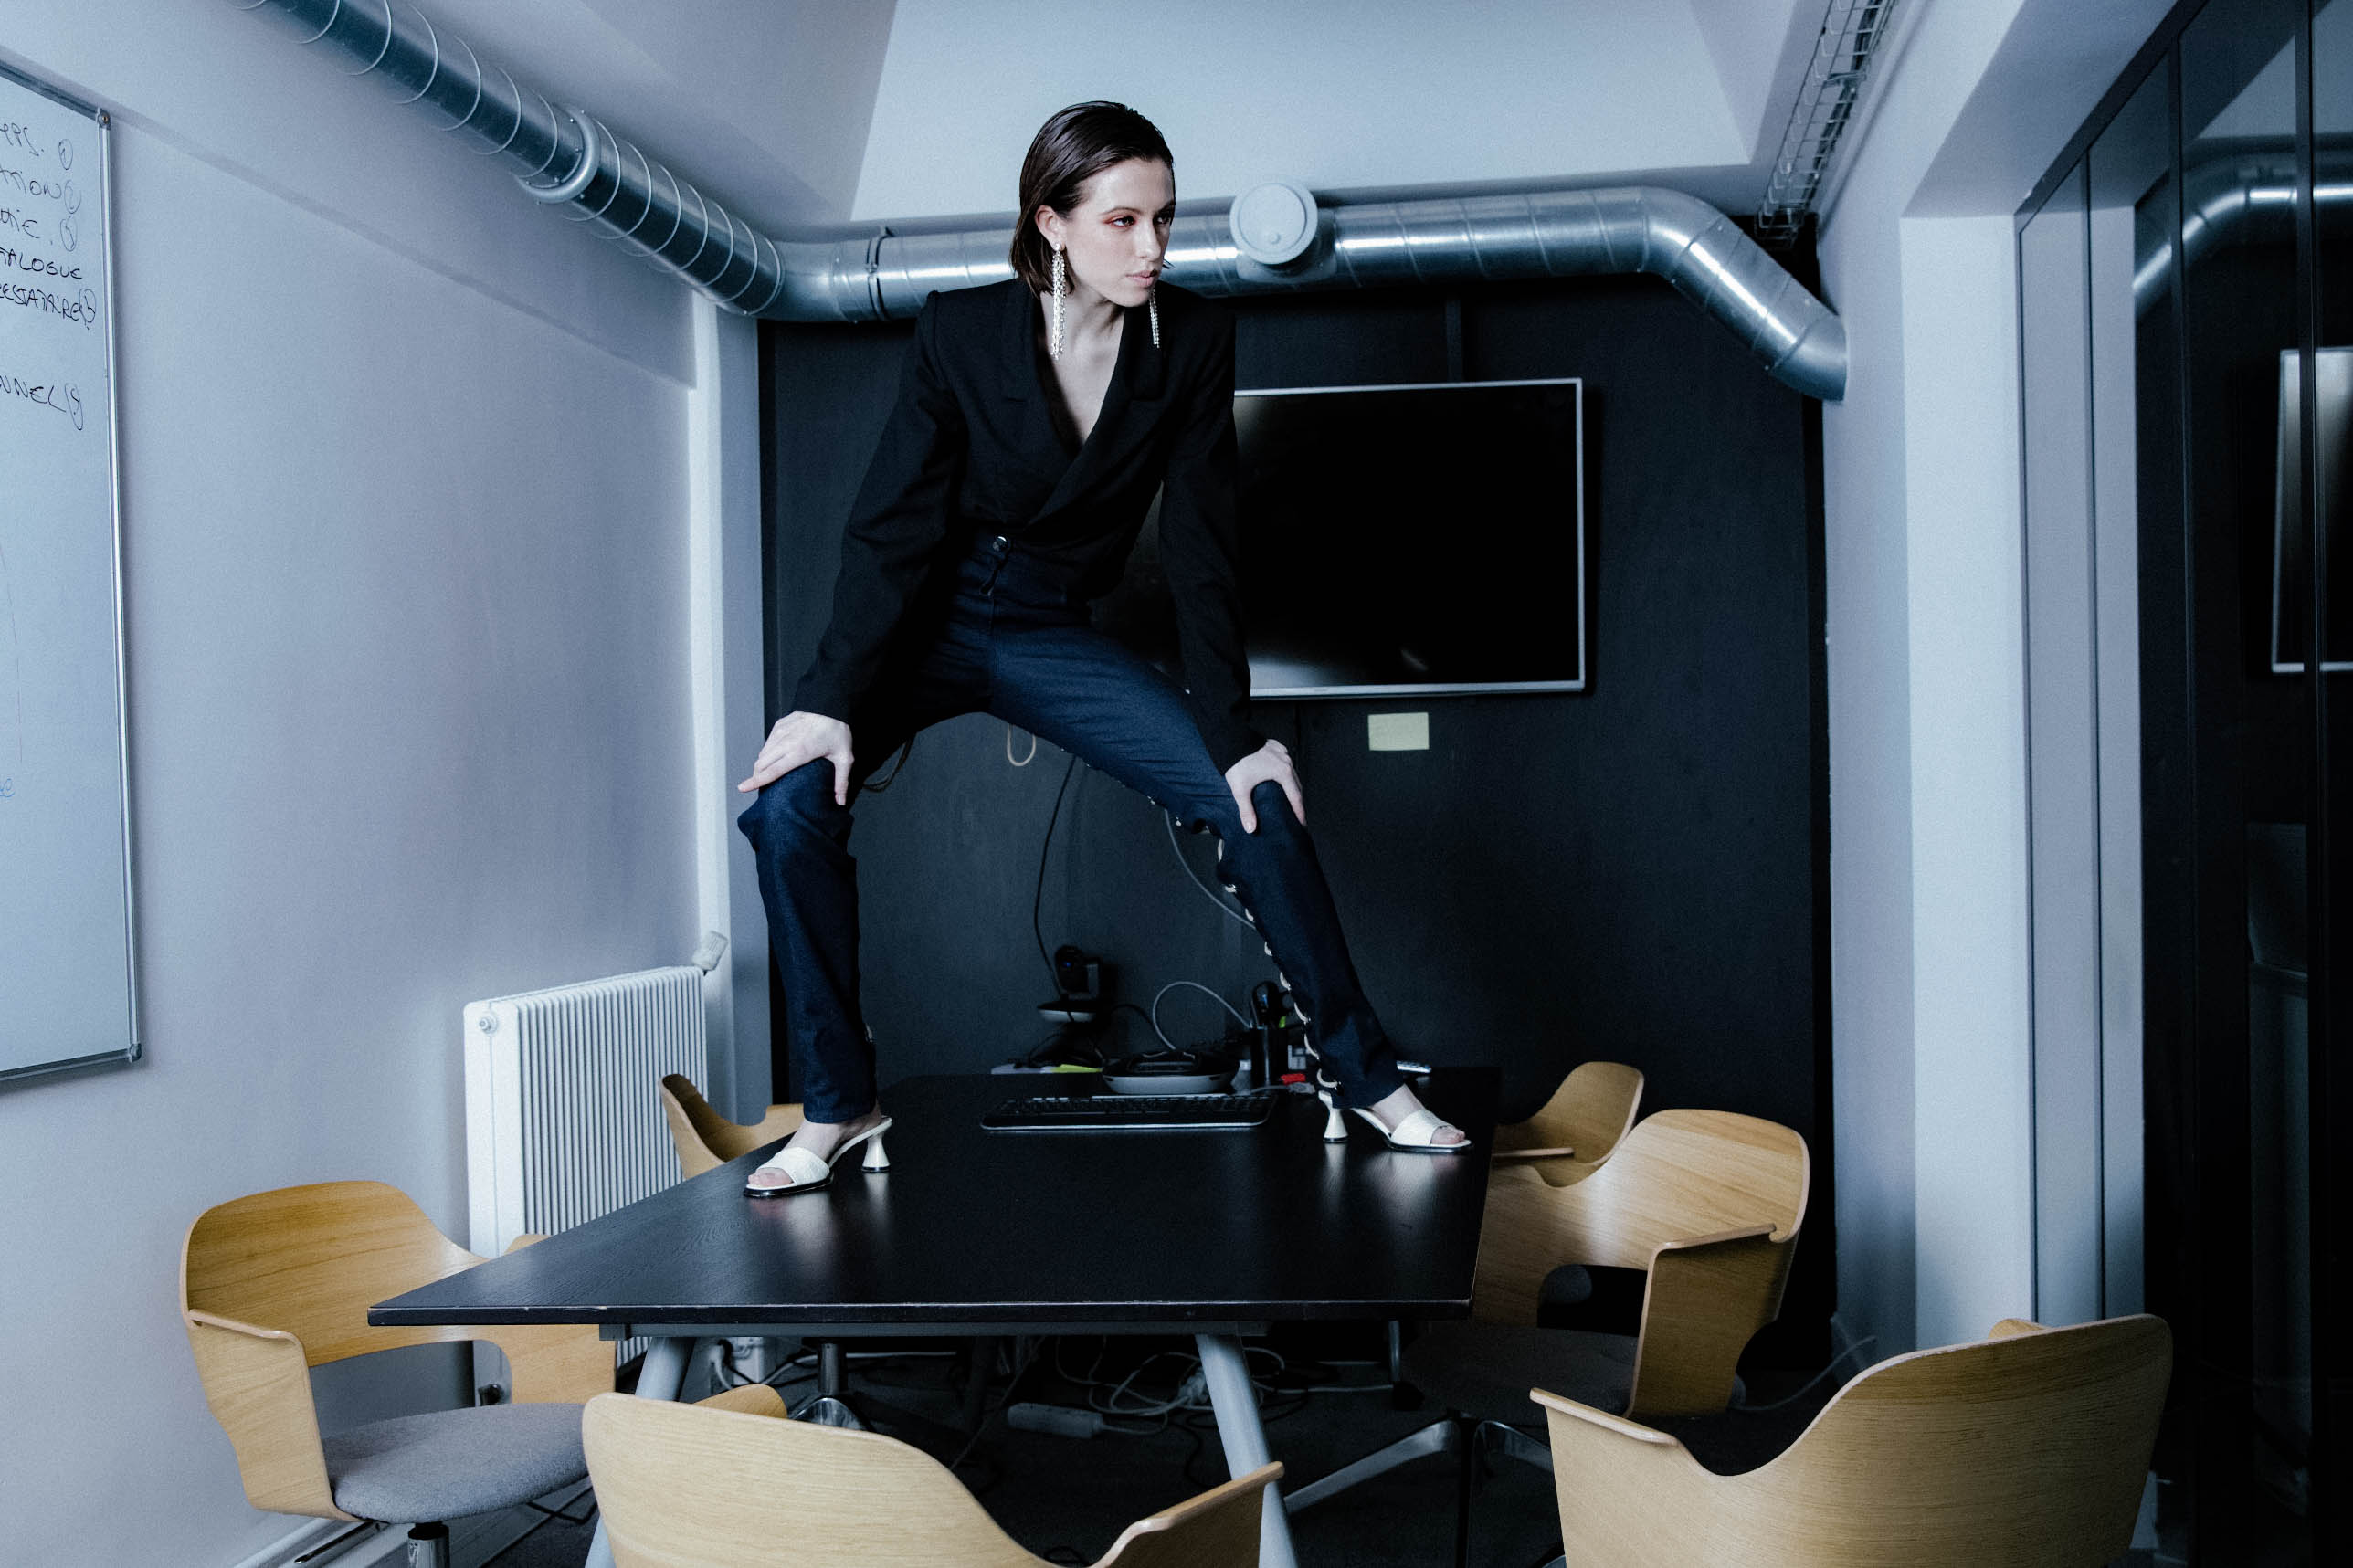 THE EMPTY INDUSTRY | Photographer: Renata Kats | Style: Alexandra Osina | Makeup + Hair: Christine Frame